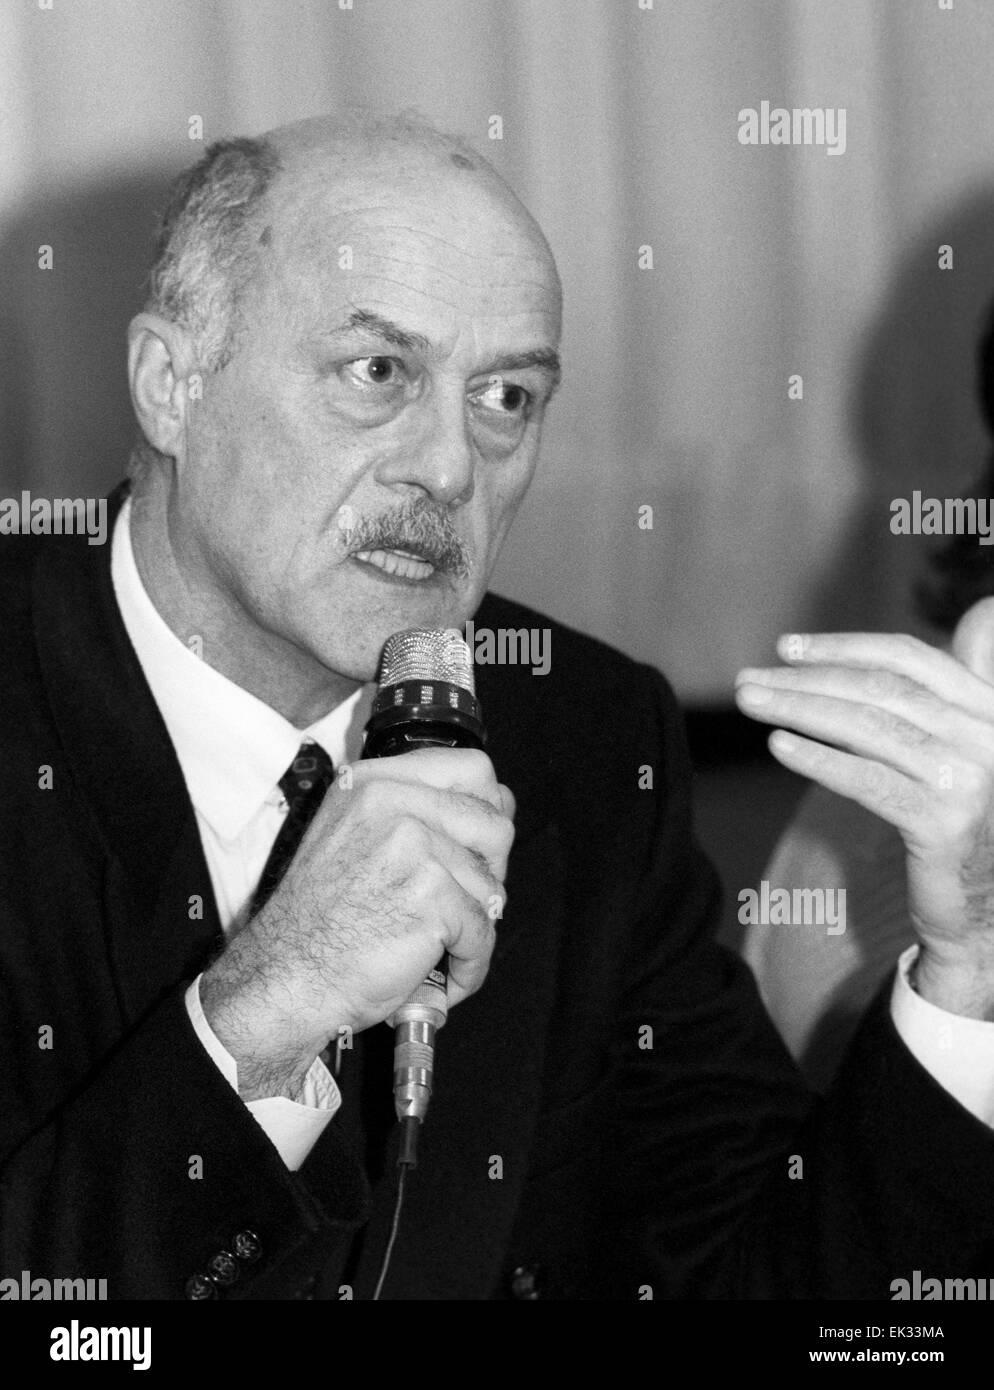 Actor and director Stanislav Govorukhin passed away